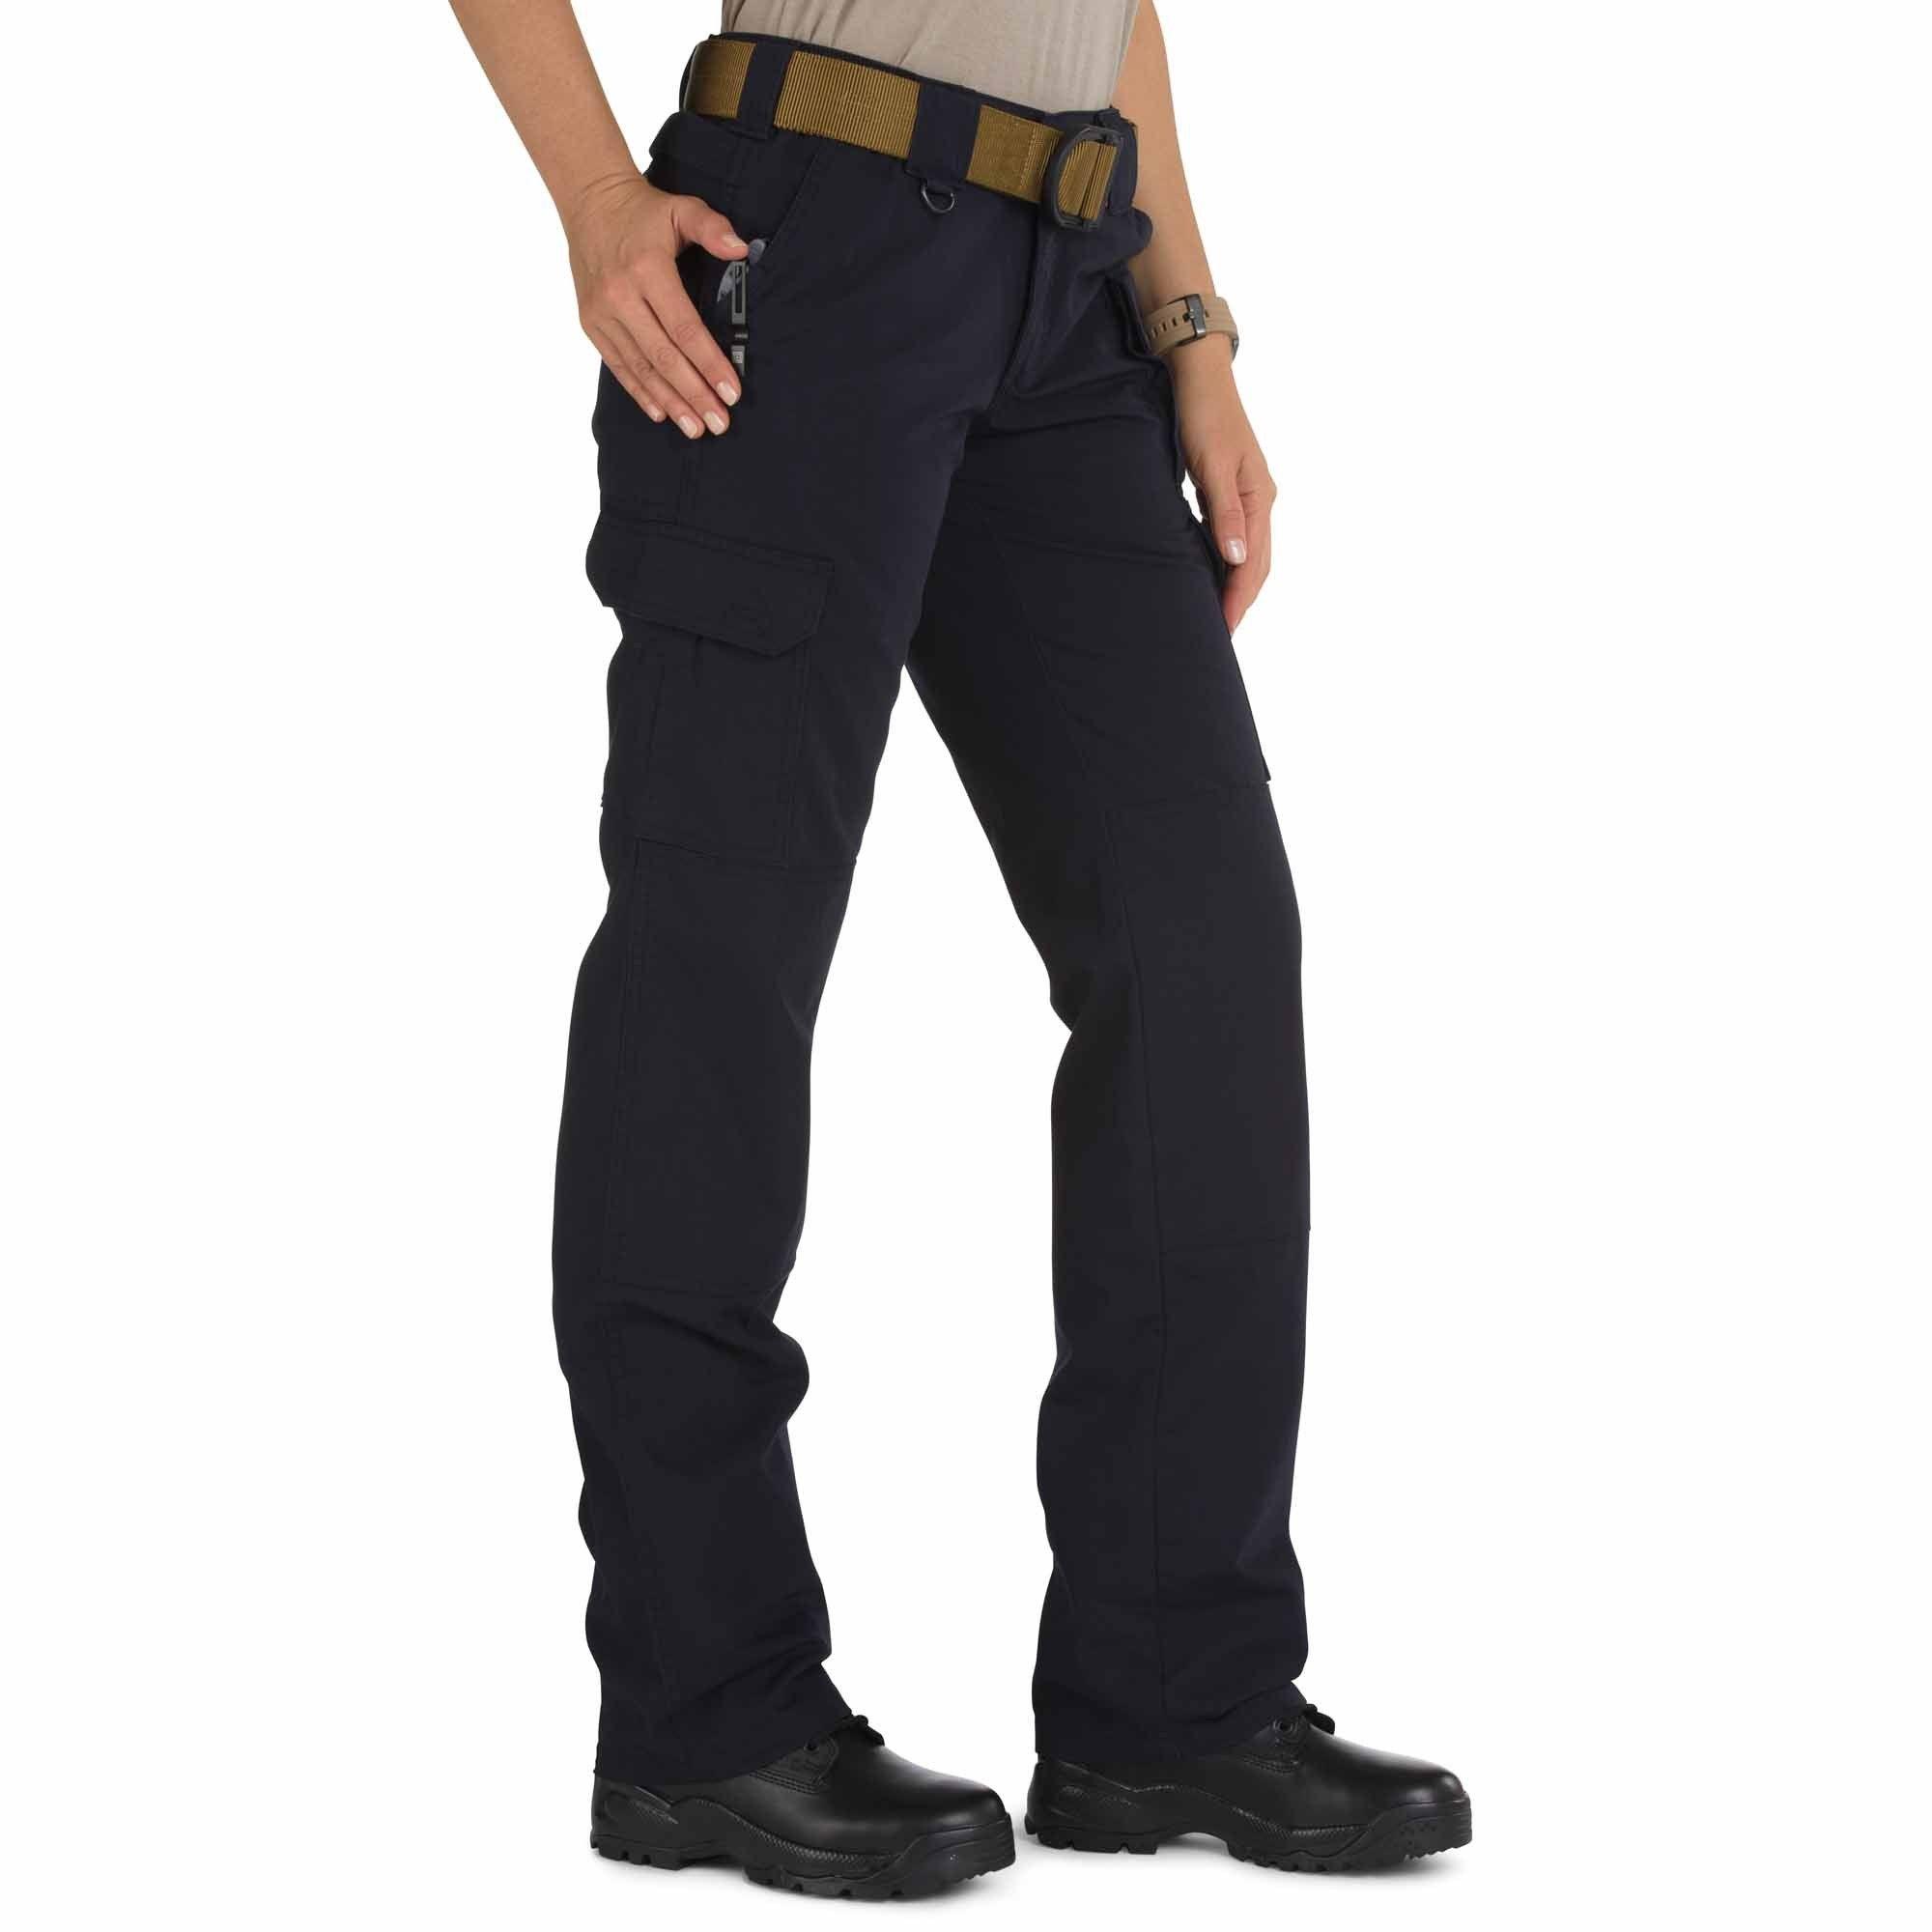 cc4ec8c4ff6 5.11 Tactical Pant - Women s in Fire Navy